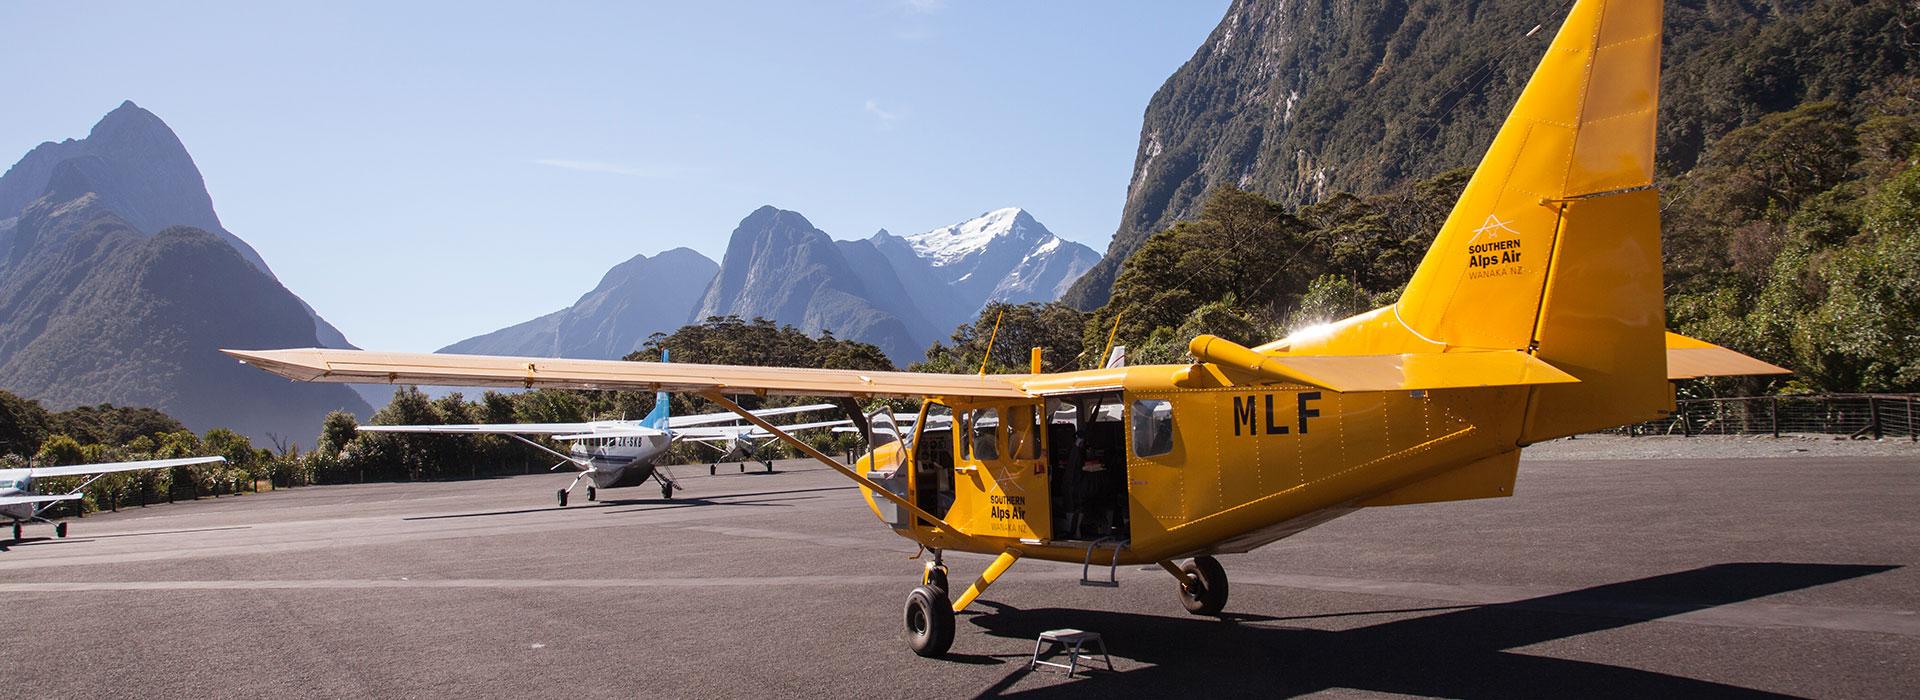 Milford Sound Flight + Landing & Glaciers $349pp (was $515)